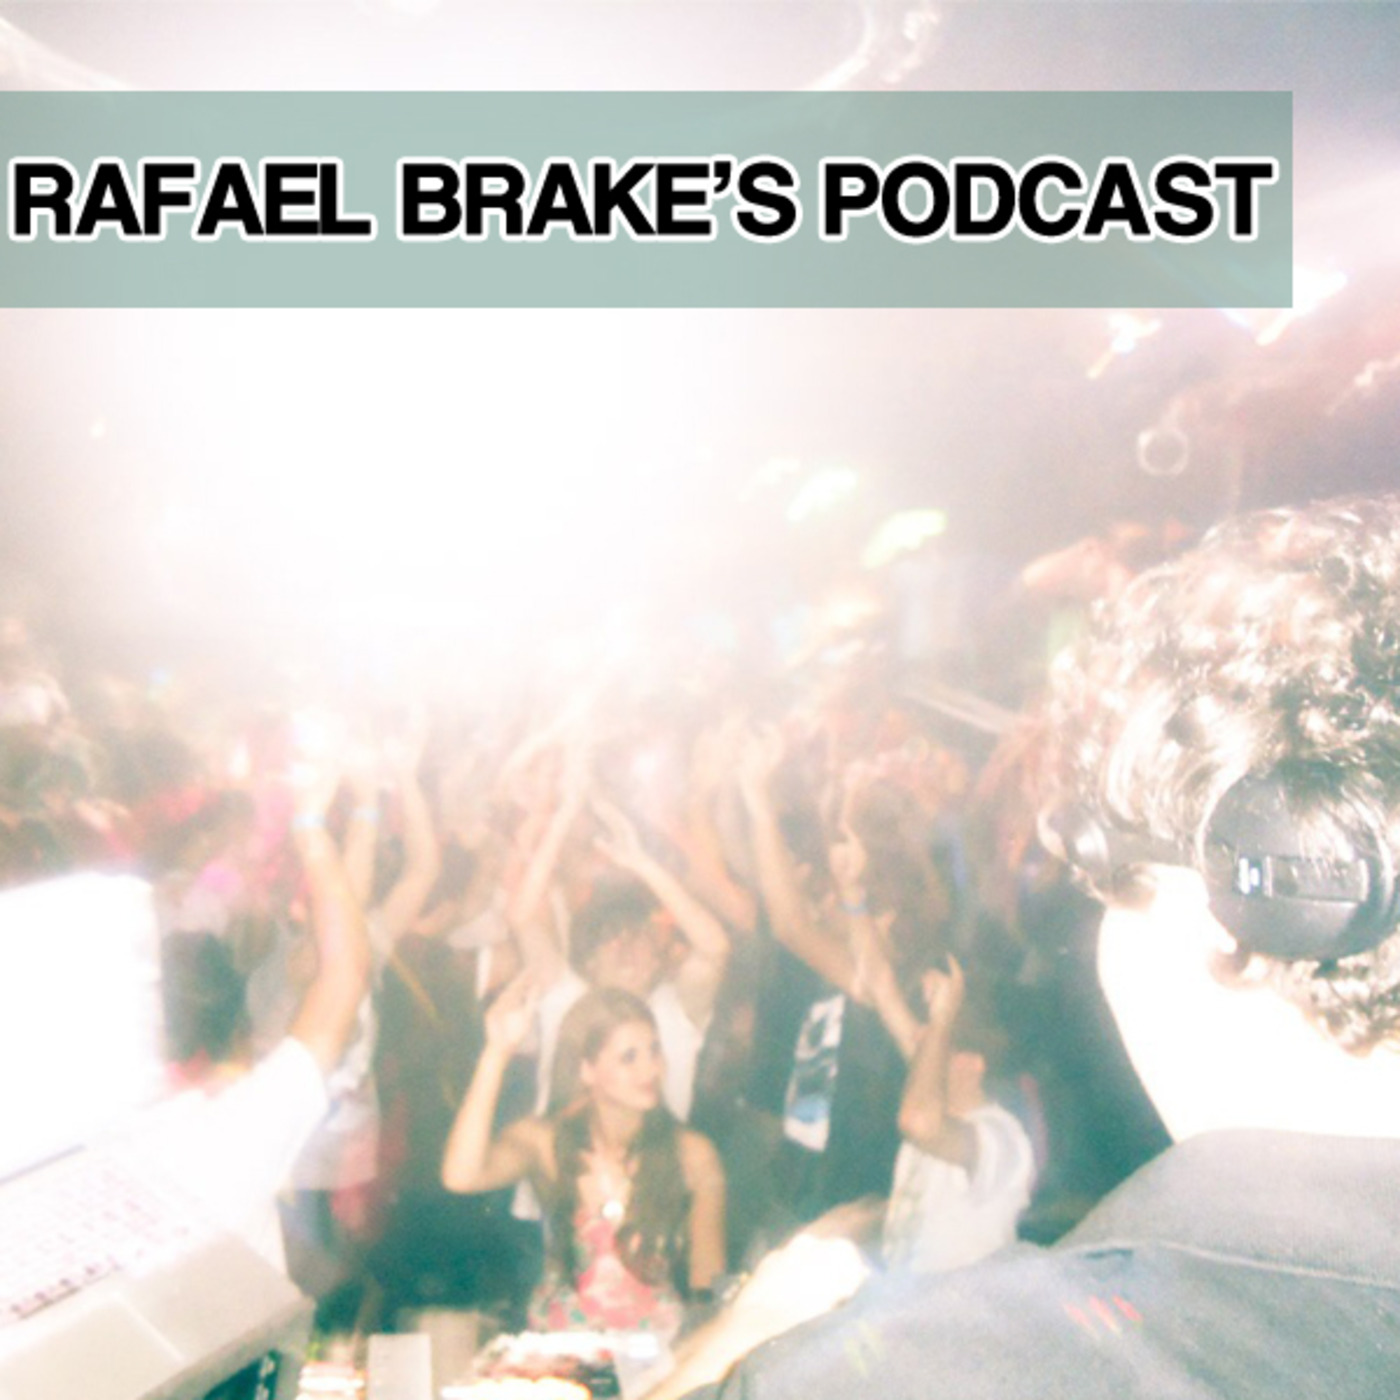 Rafael Brake's Podcast